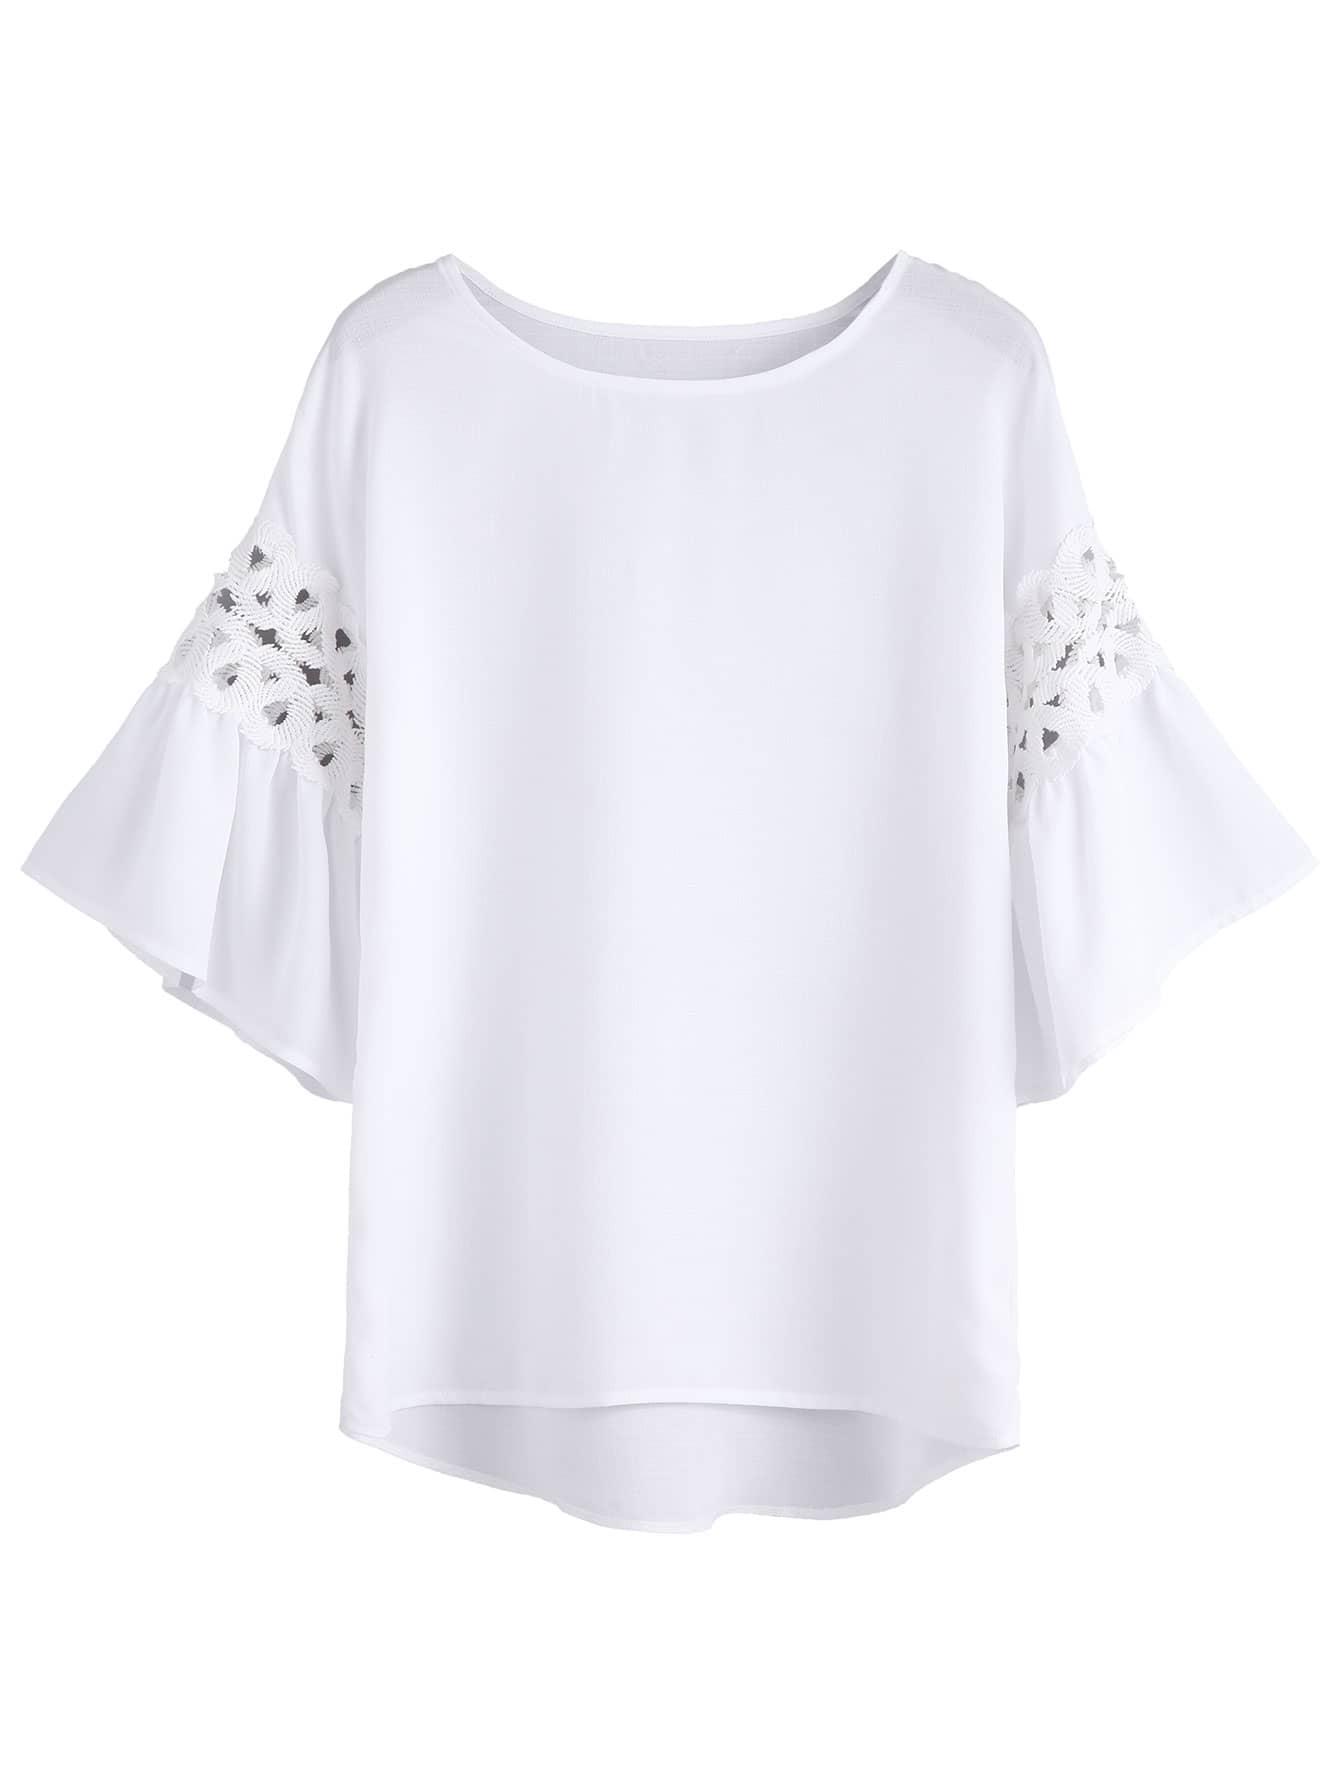 blouse160825321_2